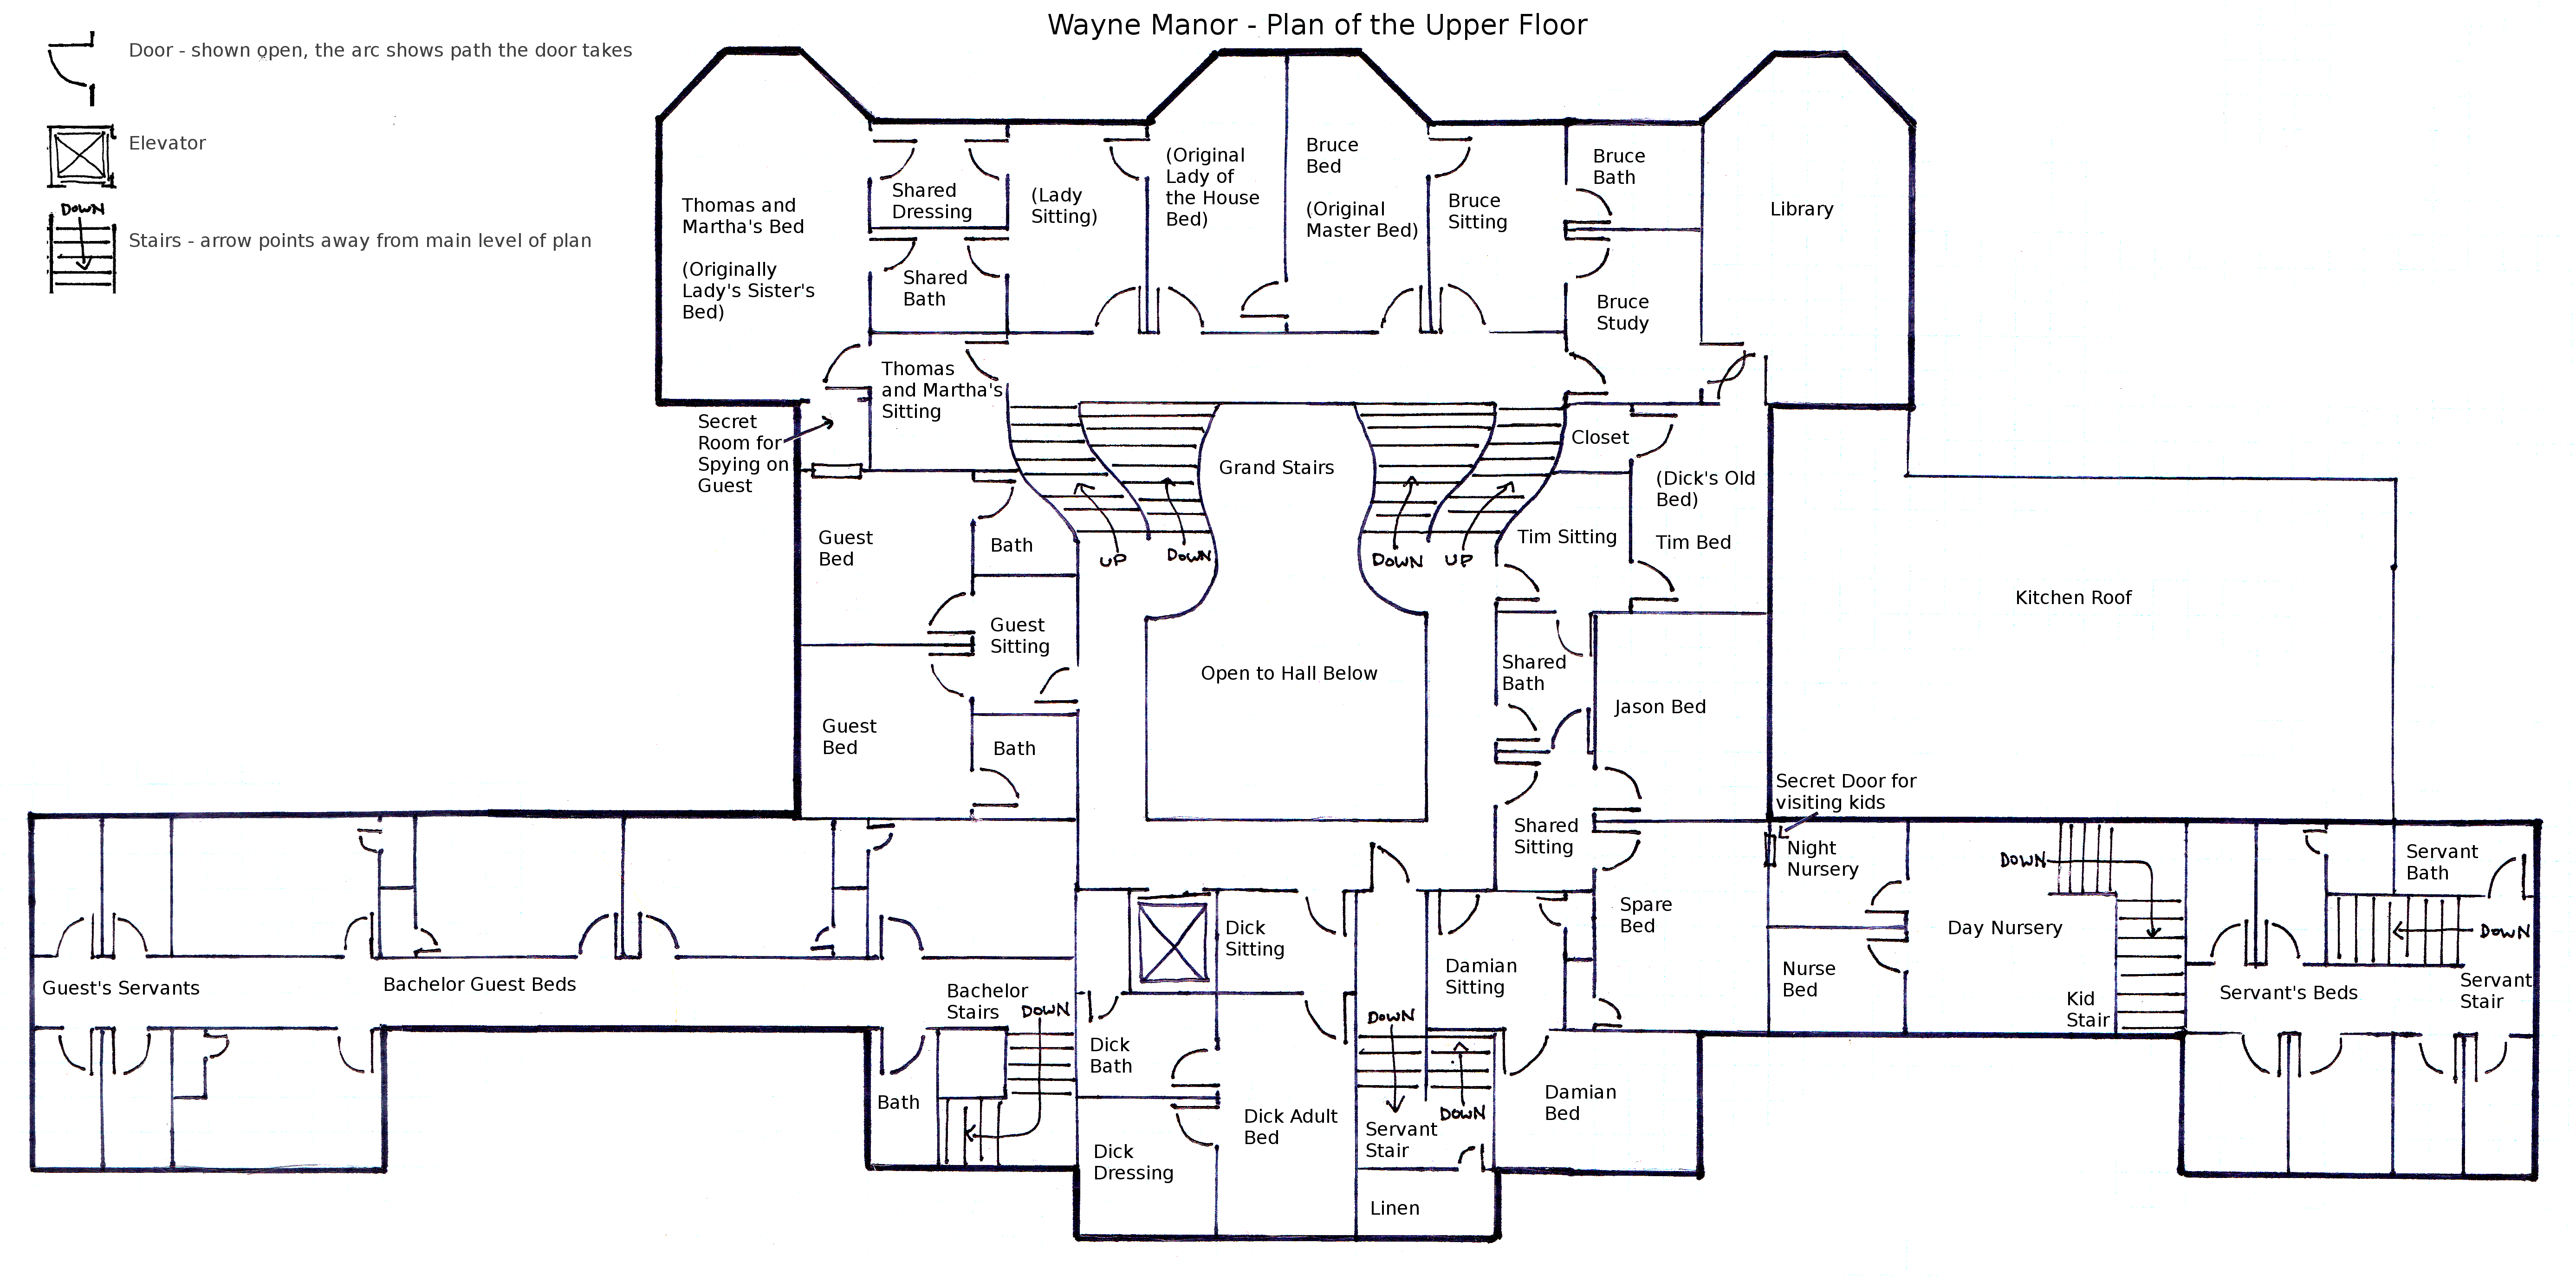 Wayne Manor Upper Floor Plan By Geckobot On Deviantart